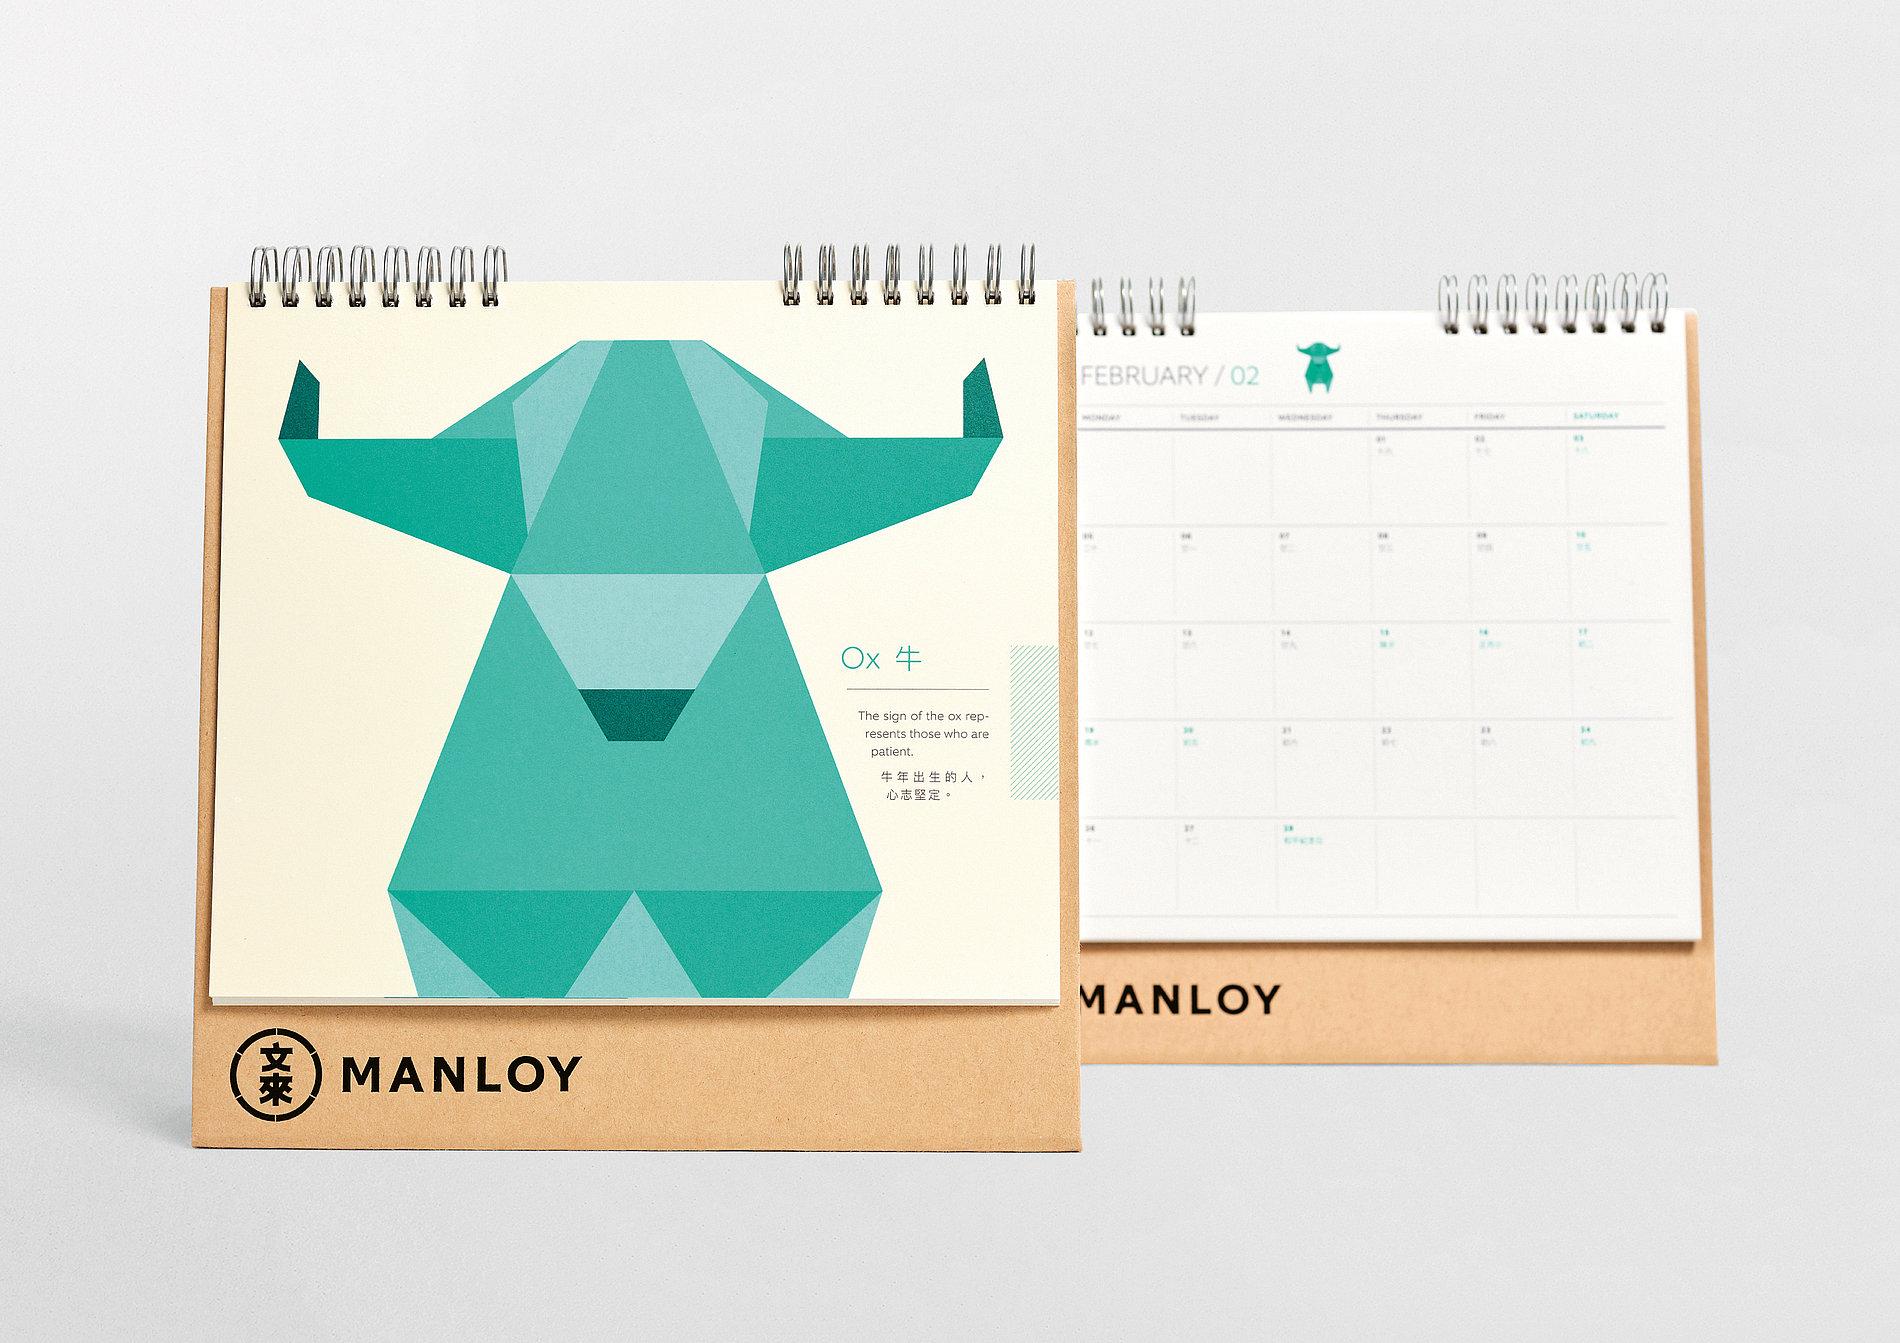 Manloy | Red Dot Design Award